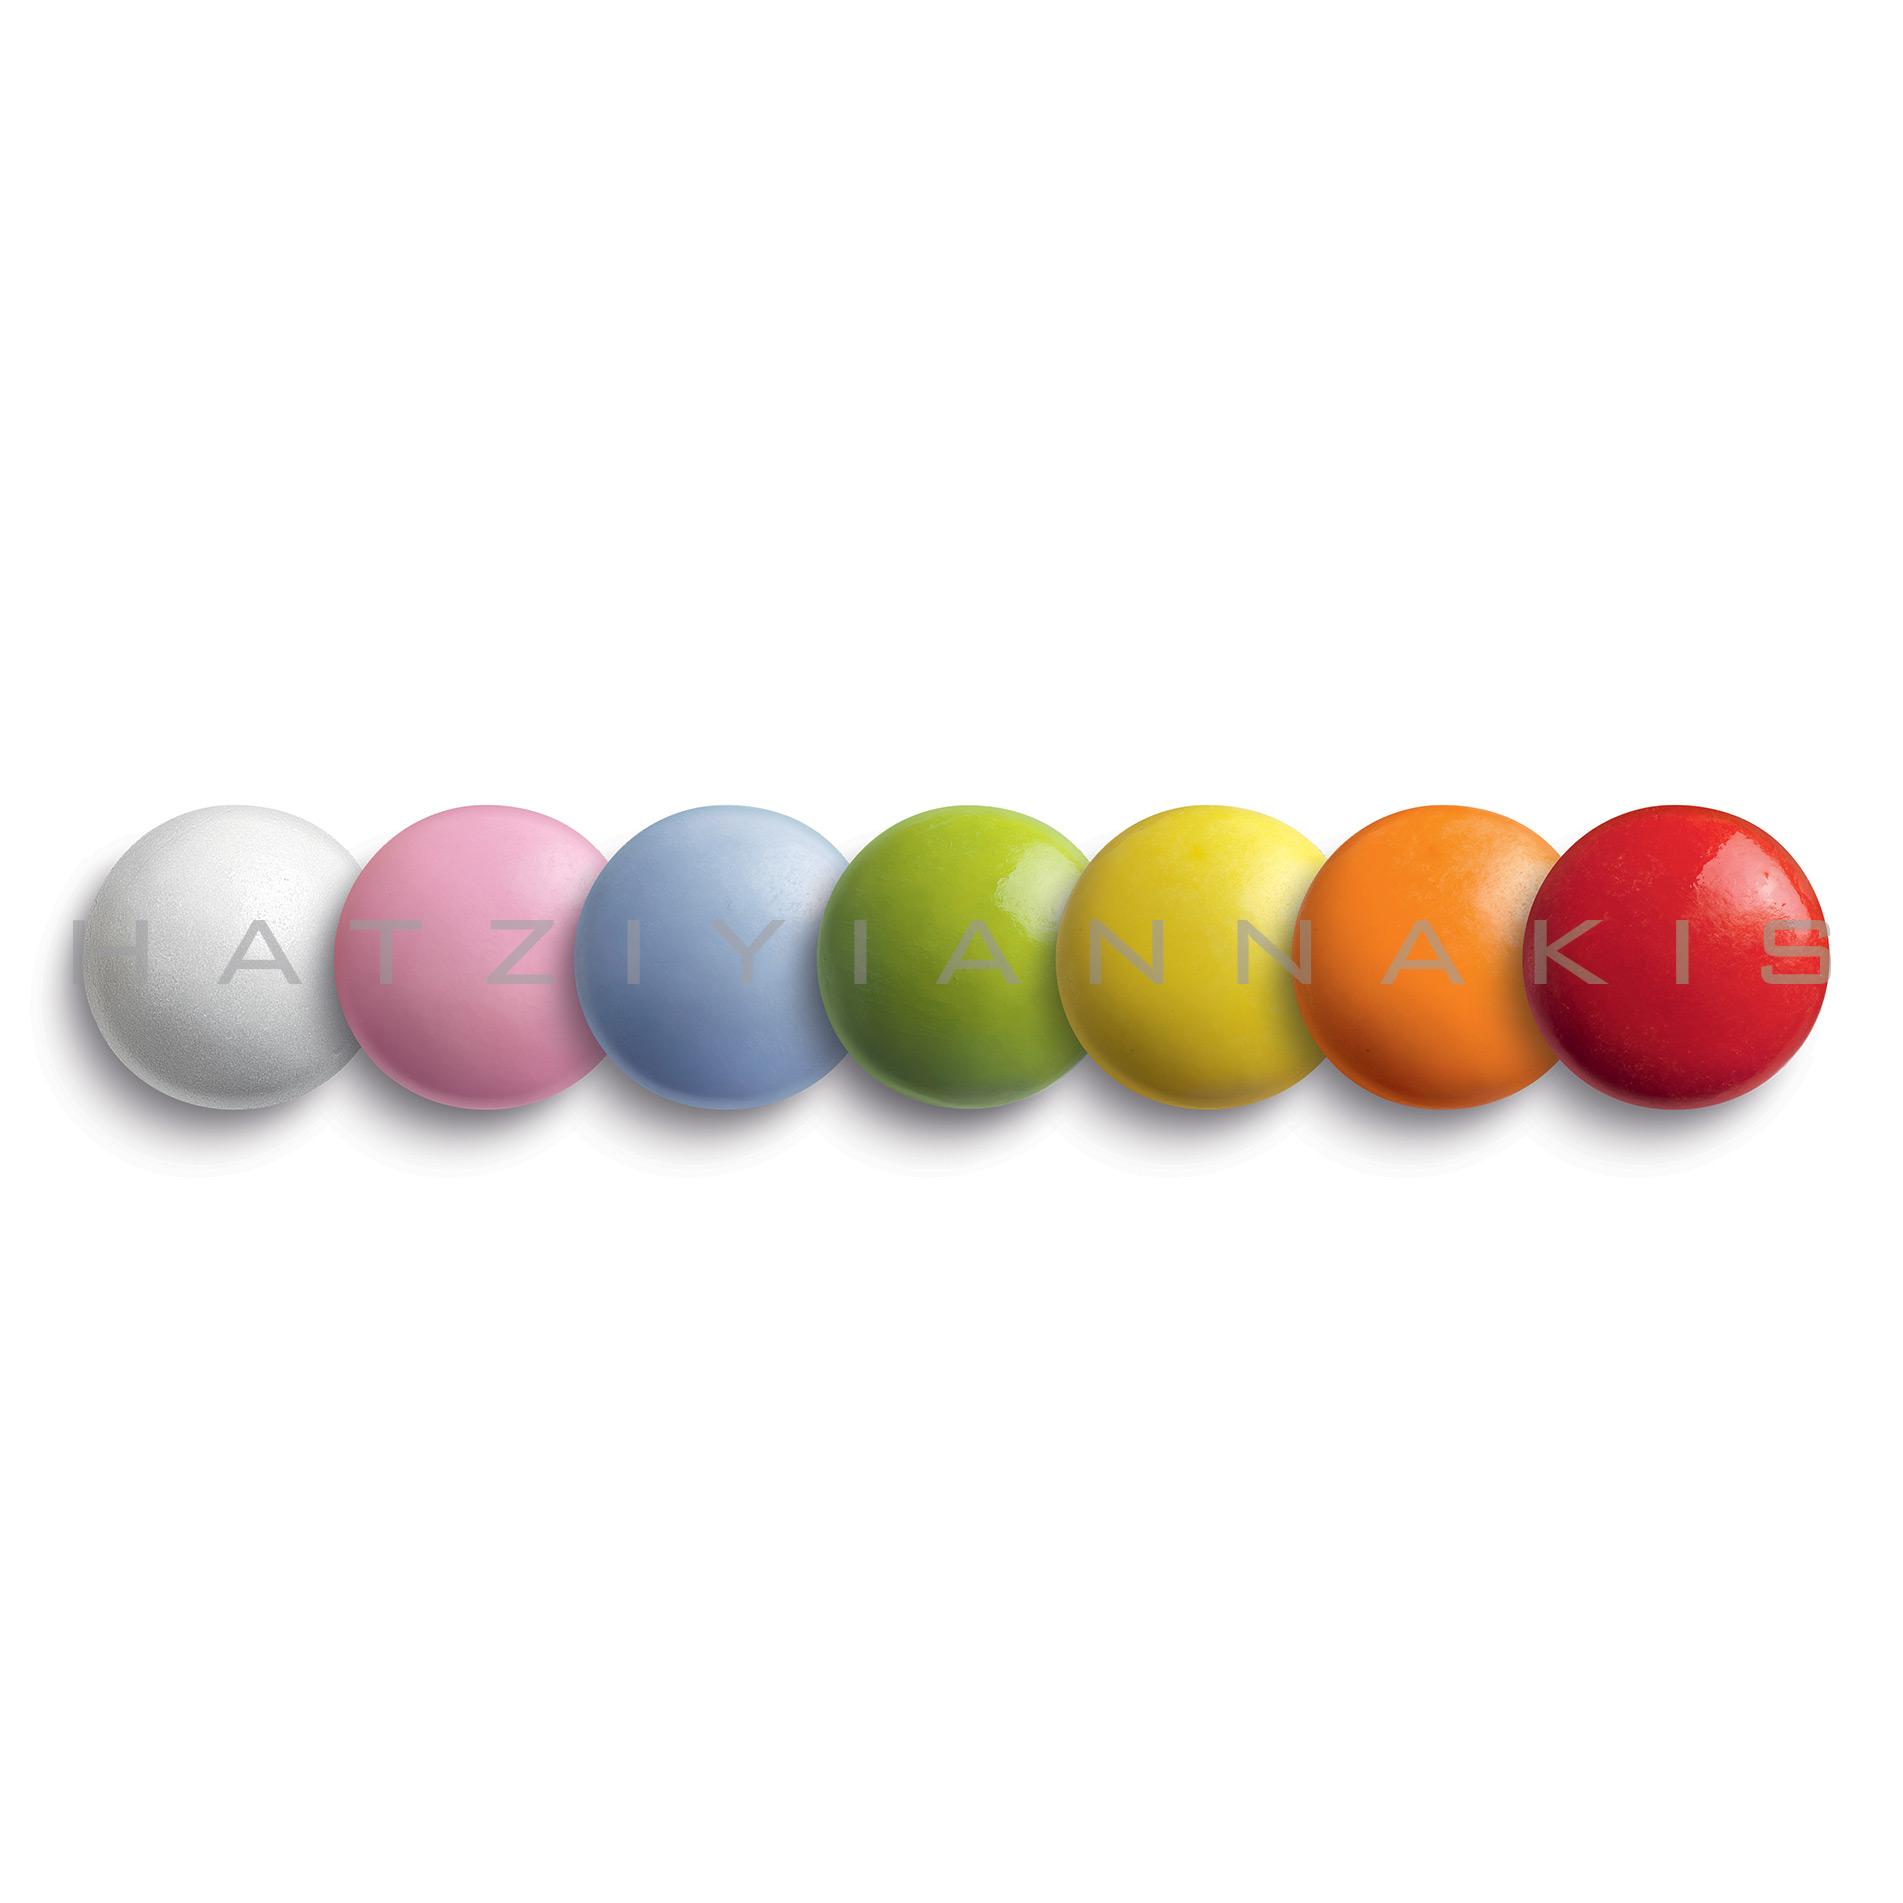 Koυφέτο rondo bebe πολύχρωμο (smarties) 500 gr Συσκευασία